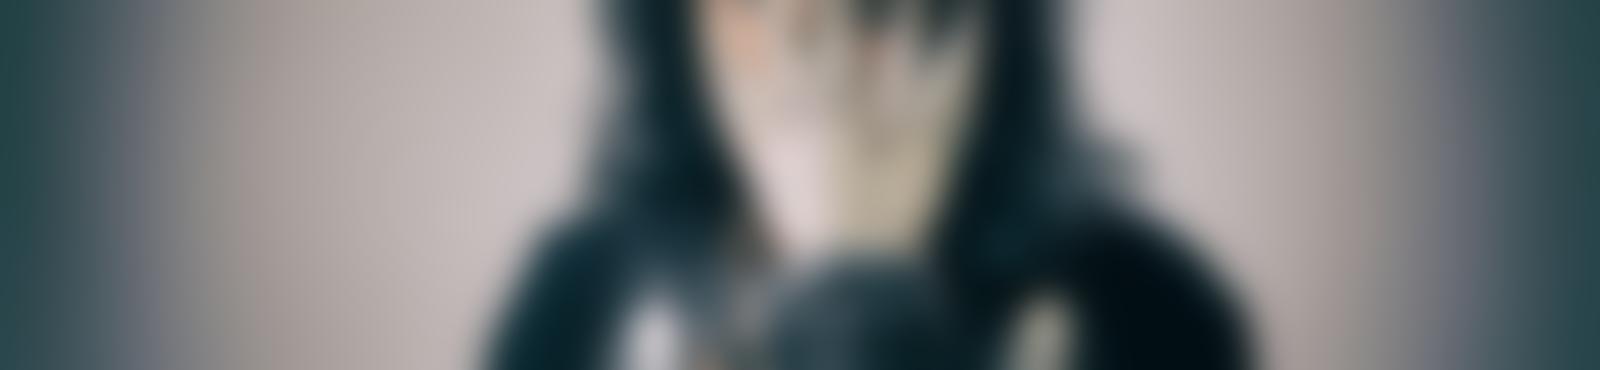 Blurred 7b76f764 dc80 4114 839c b1dd5028198c